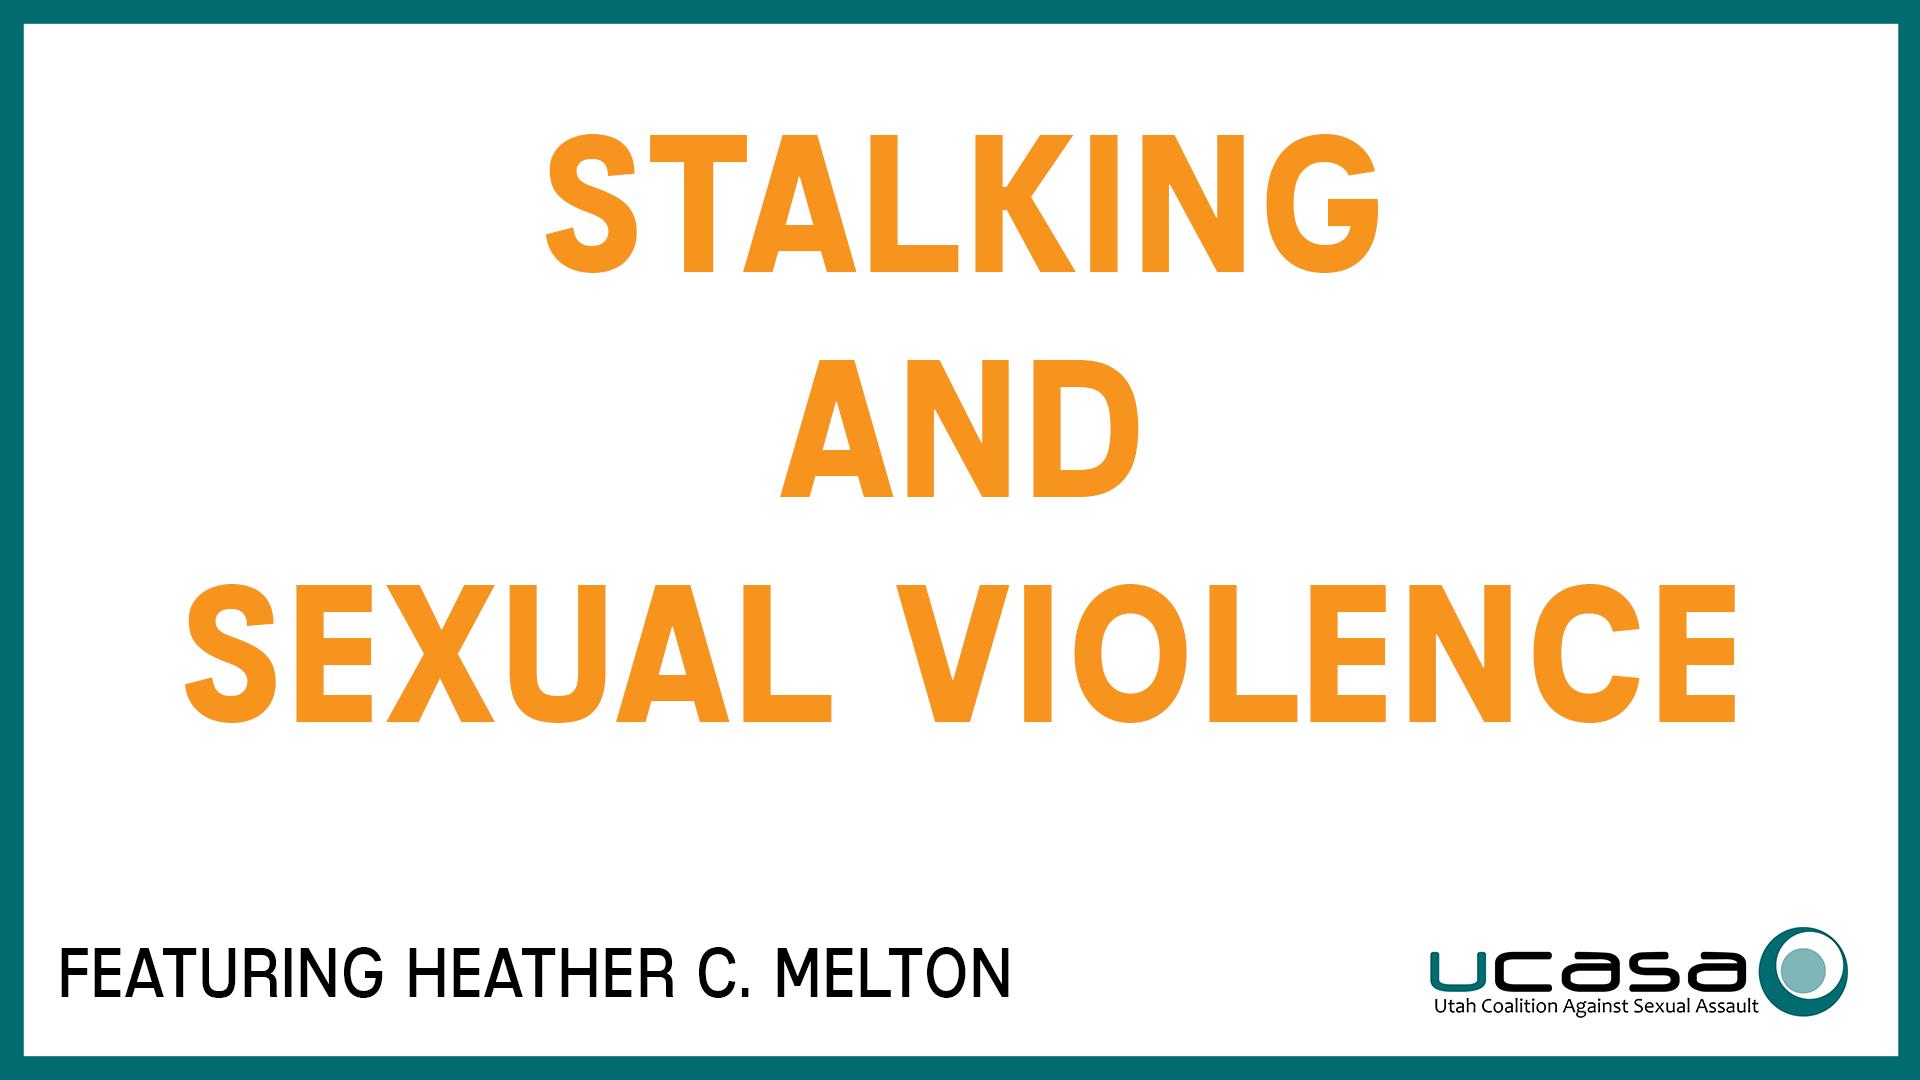 stalkingfacebook.png